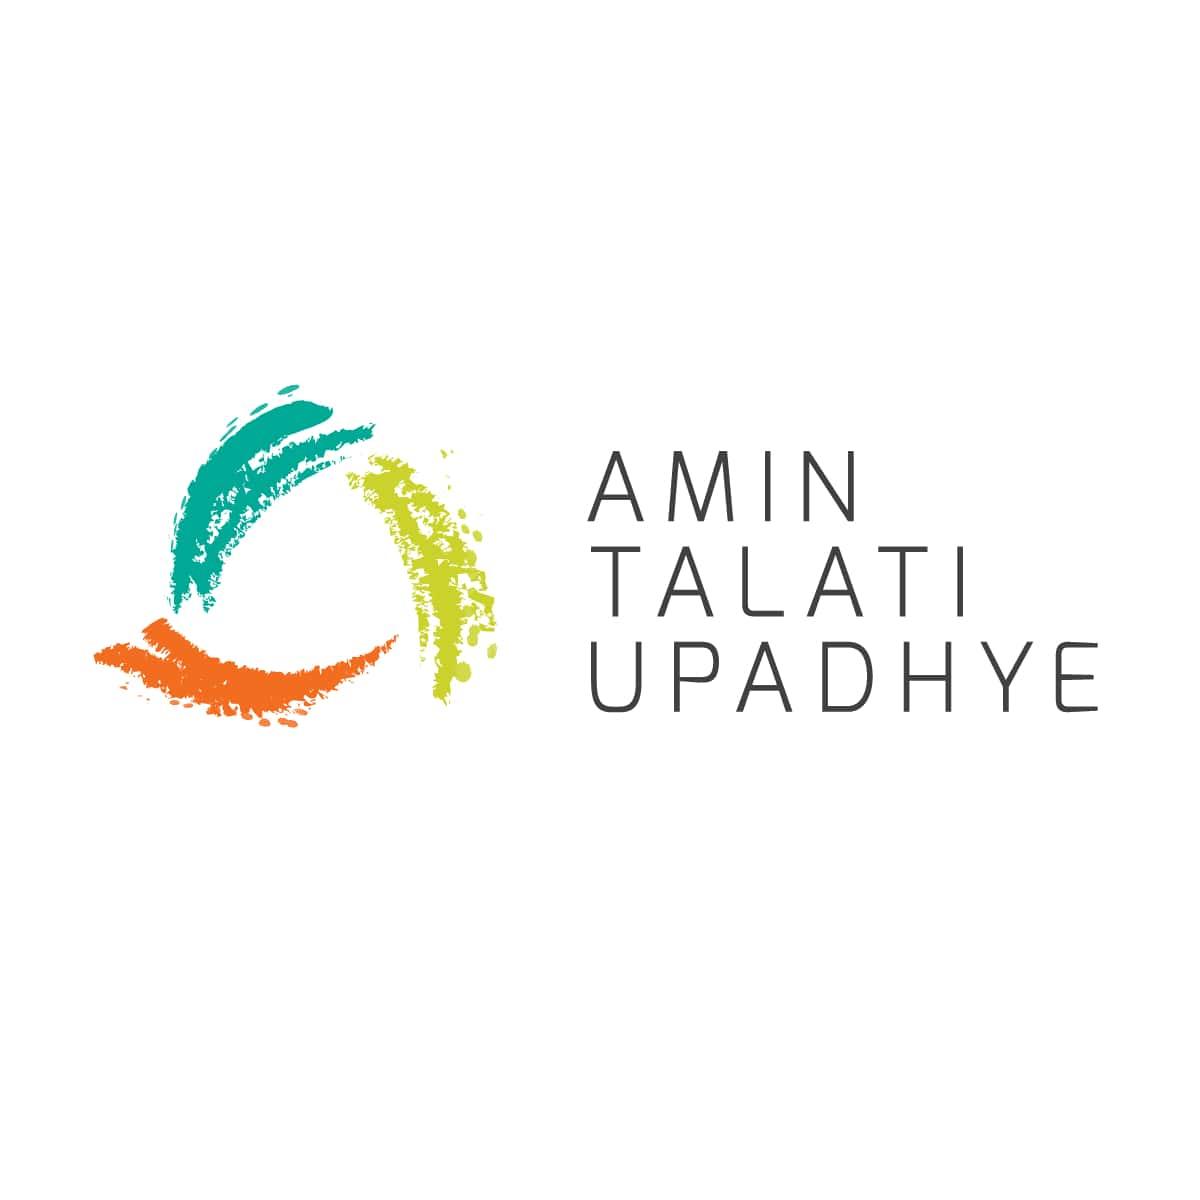 Amin Talati Upadhye - sponsoring BevNET Live Summer 2017